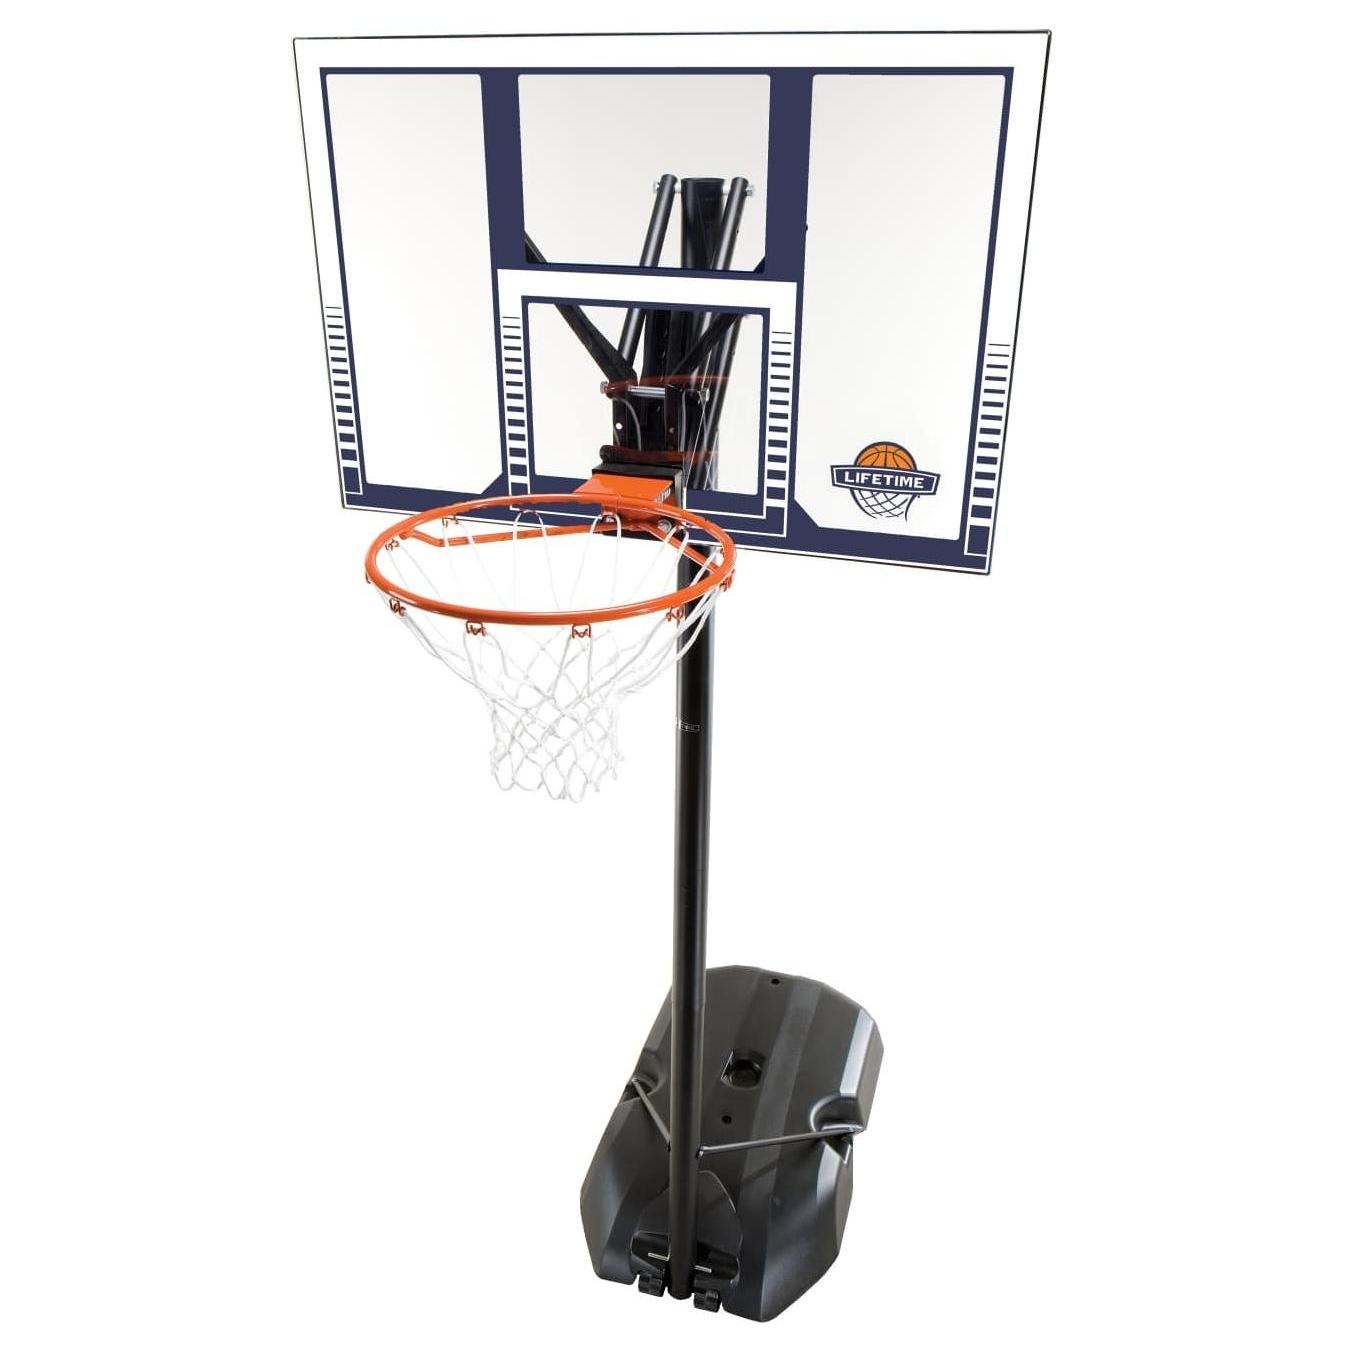 ballon de basket front court 44 dunk lifetime. Black Bedroom Furniture Sets. Home Design Ideas